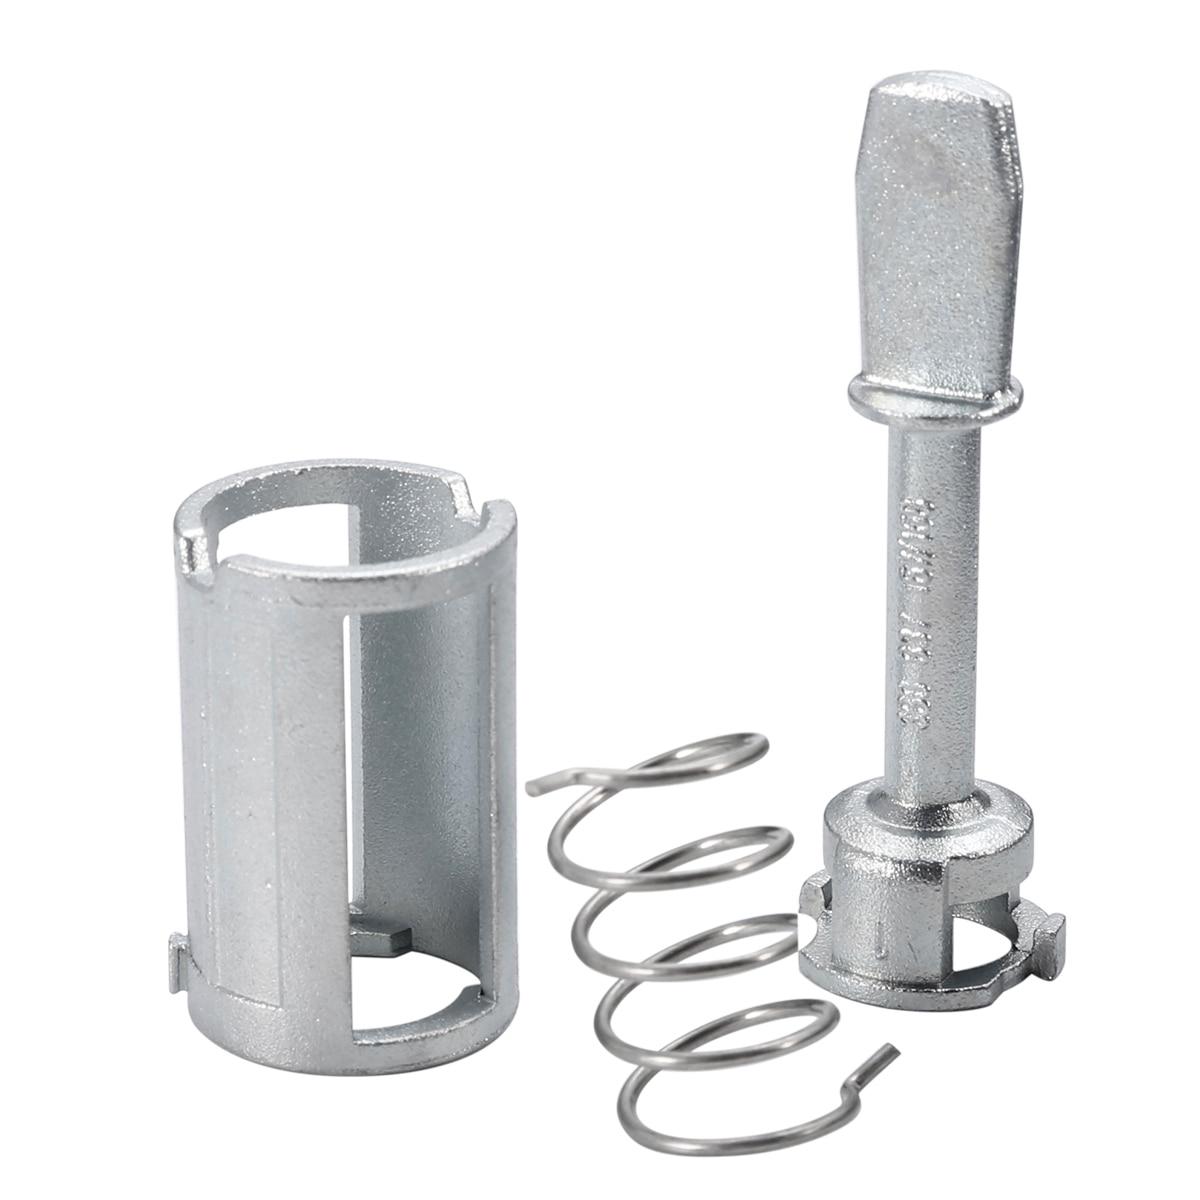 7pcs/Set Front Door Lock Cylinder Barrel Repair Kit For VW Mk4 Golf 4 Bora Locks & Hardware Door Lock Cylinder Repair Kit free shipping car lock cylinder repair kit for bw e46